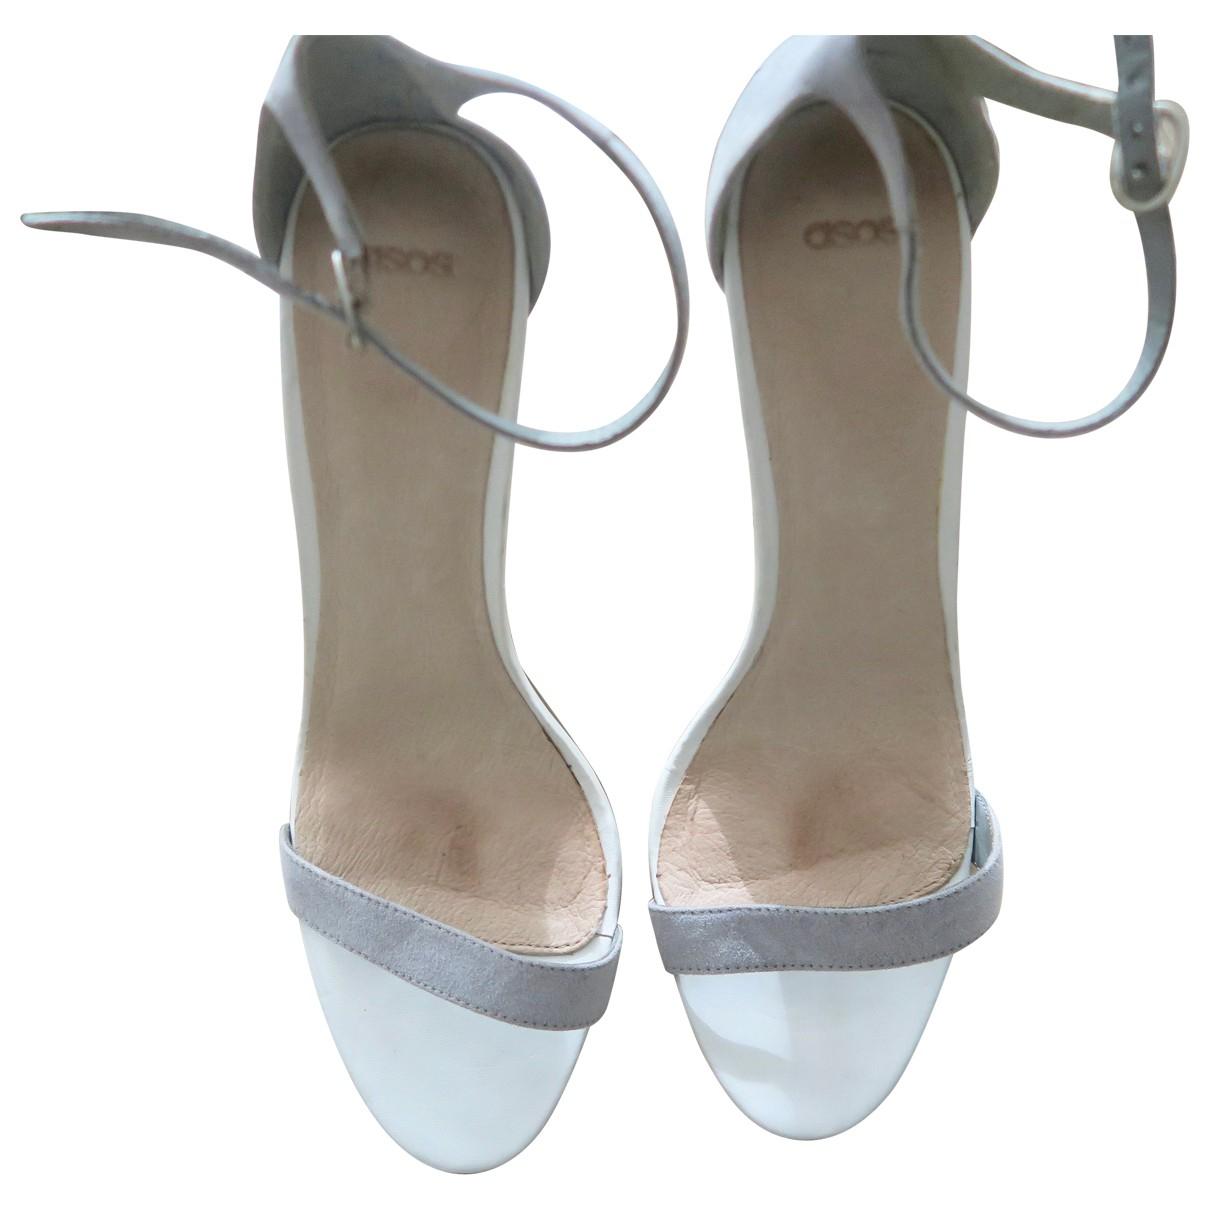 Asos \N Grey Leather Sandals for Women 41 EU